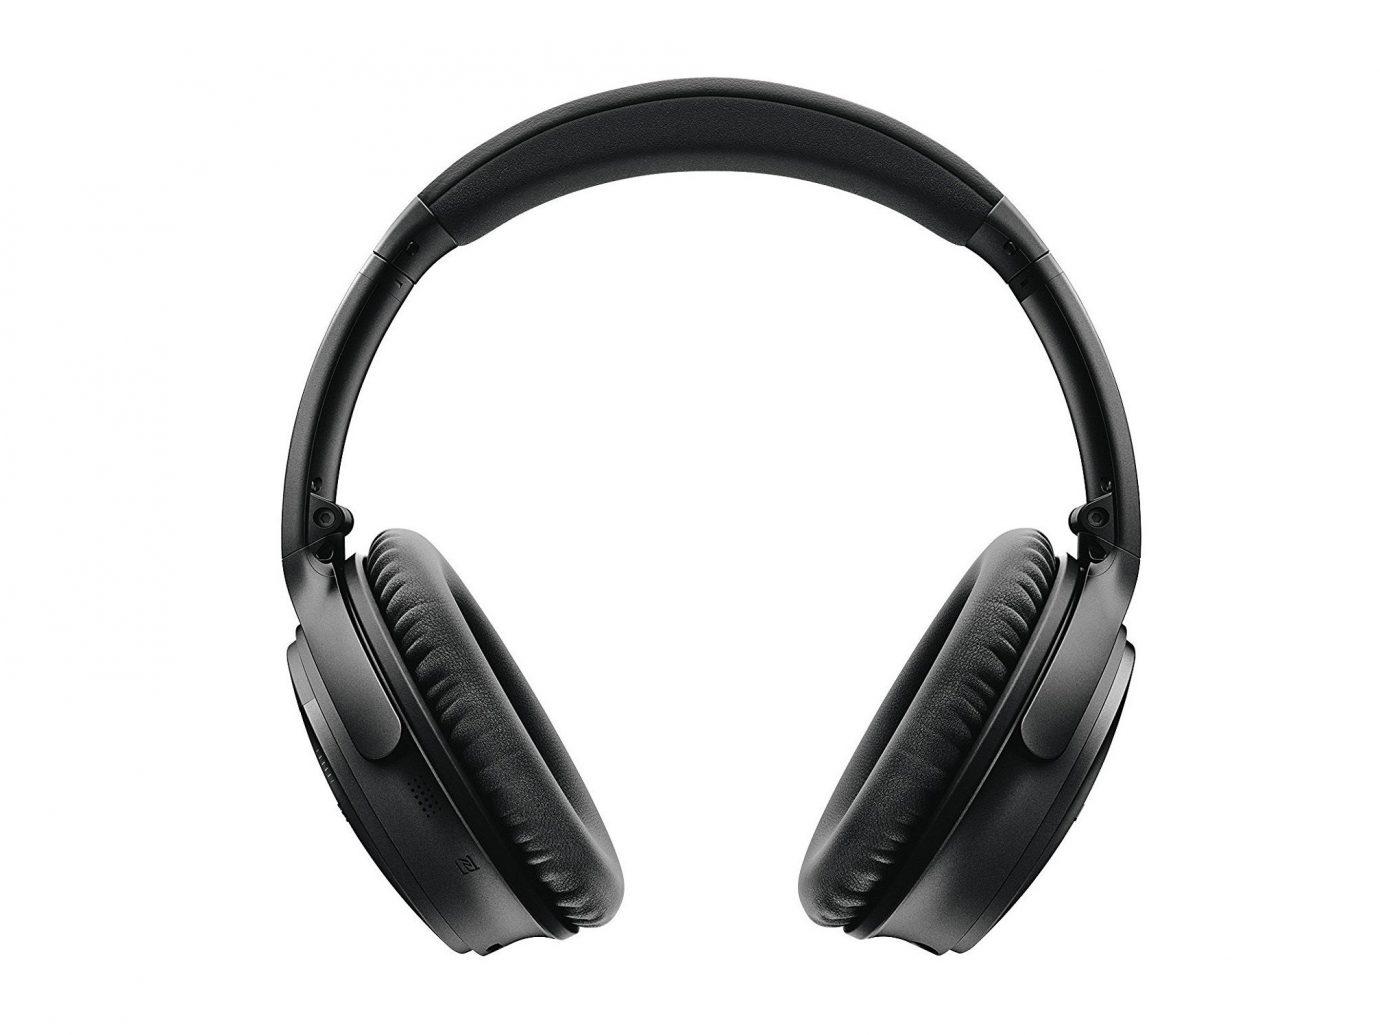 Flights Travel Shop headphones technology audio equipment electronic device audio headset product product design